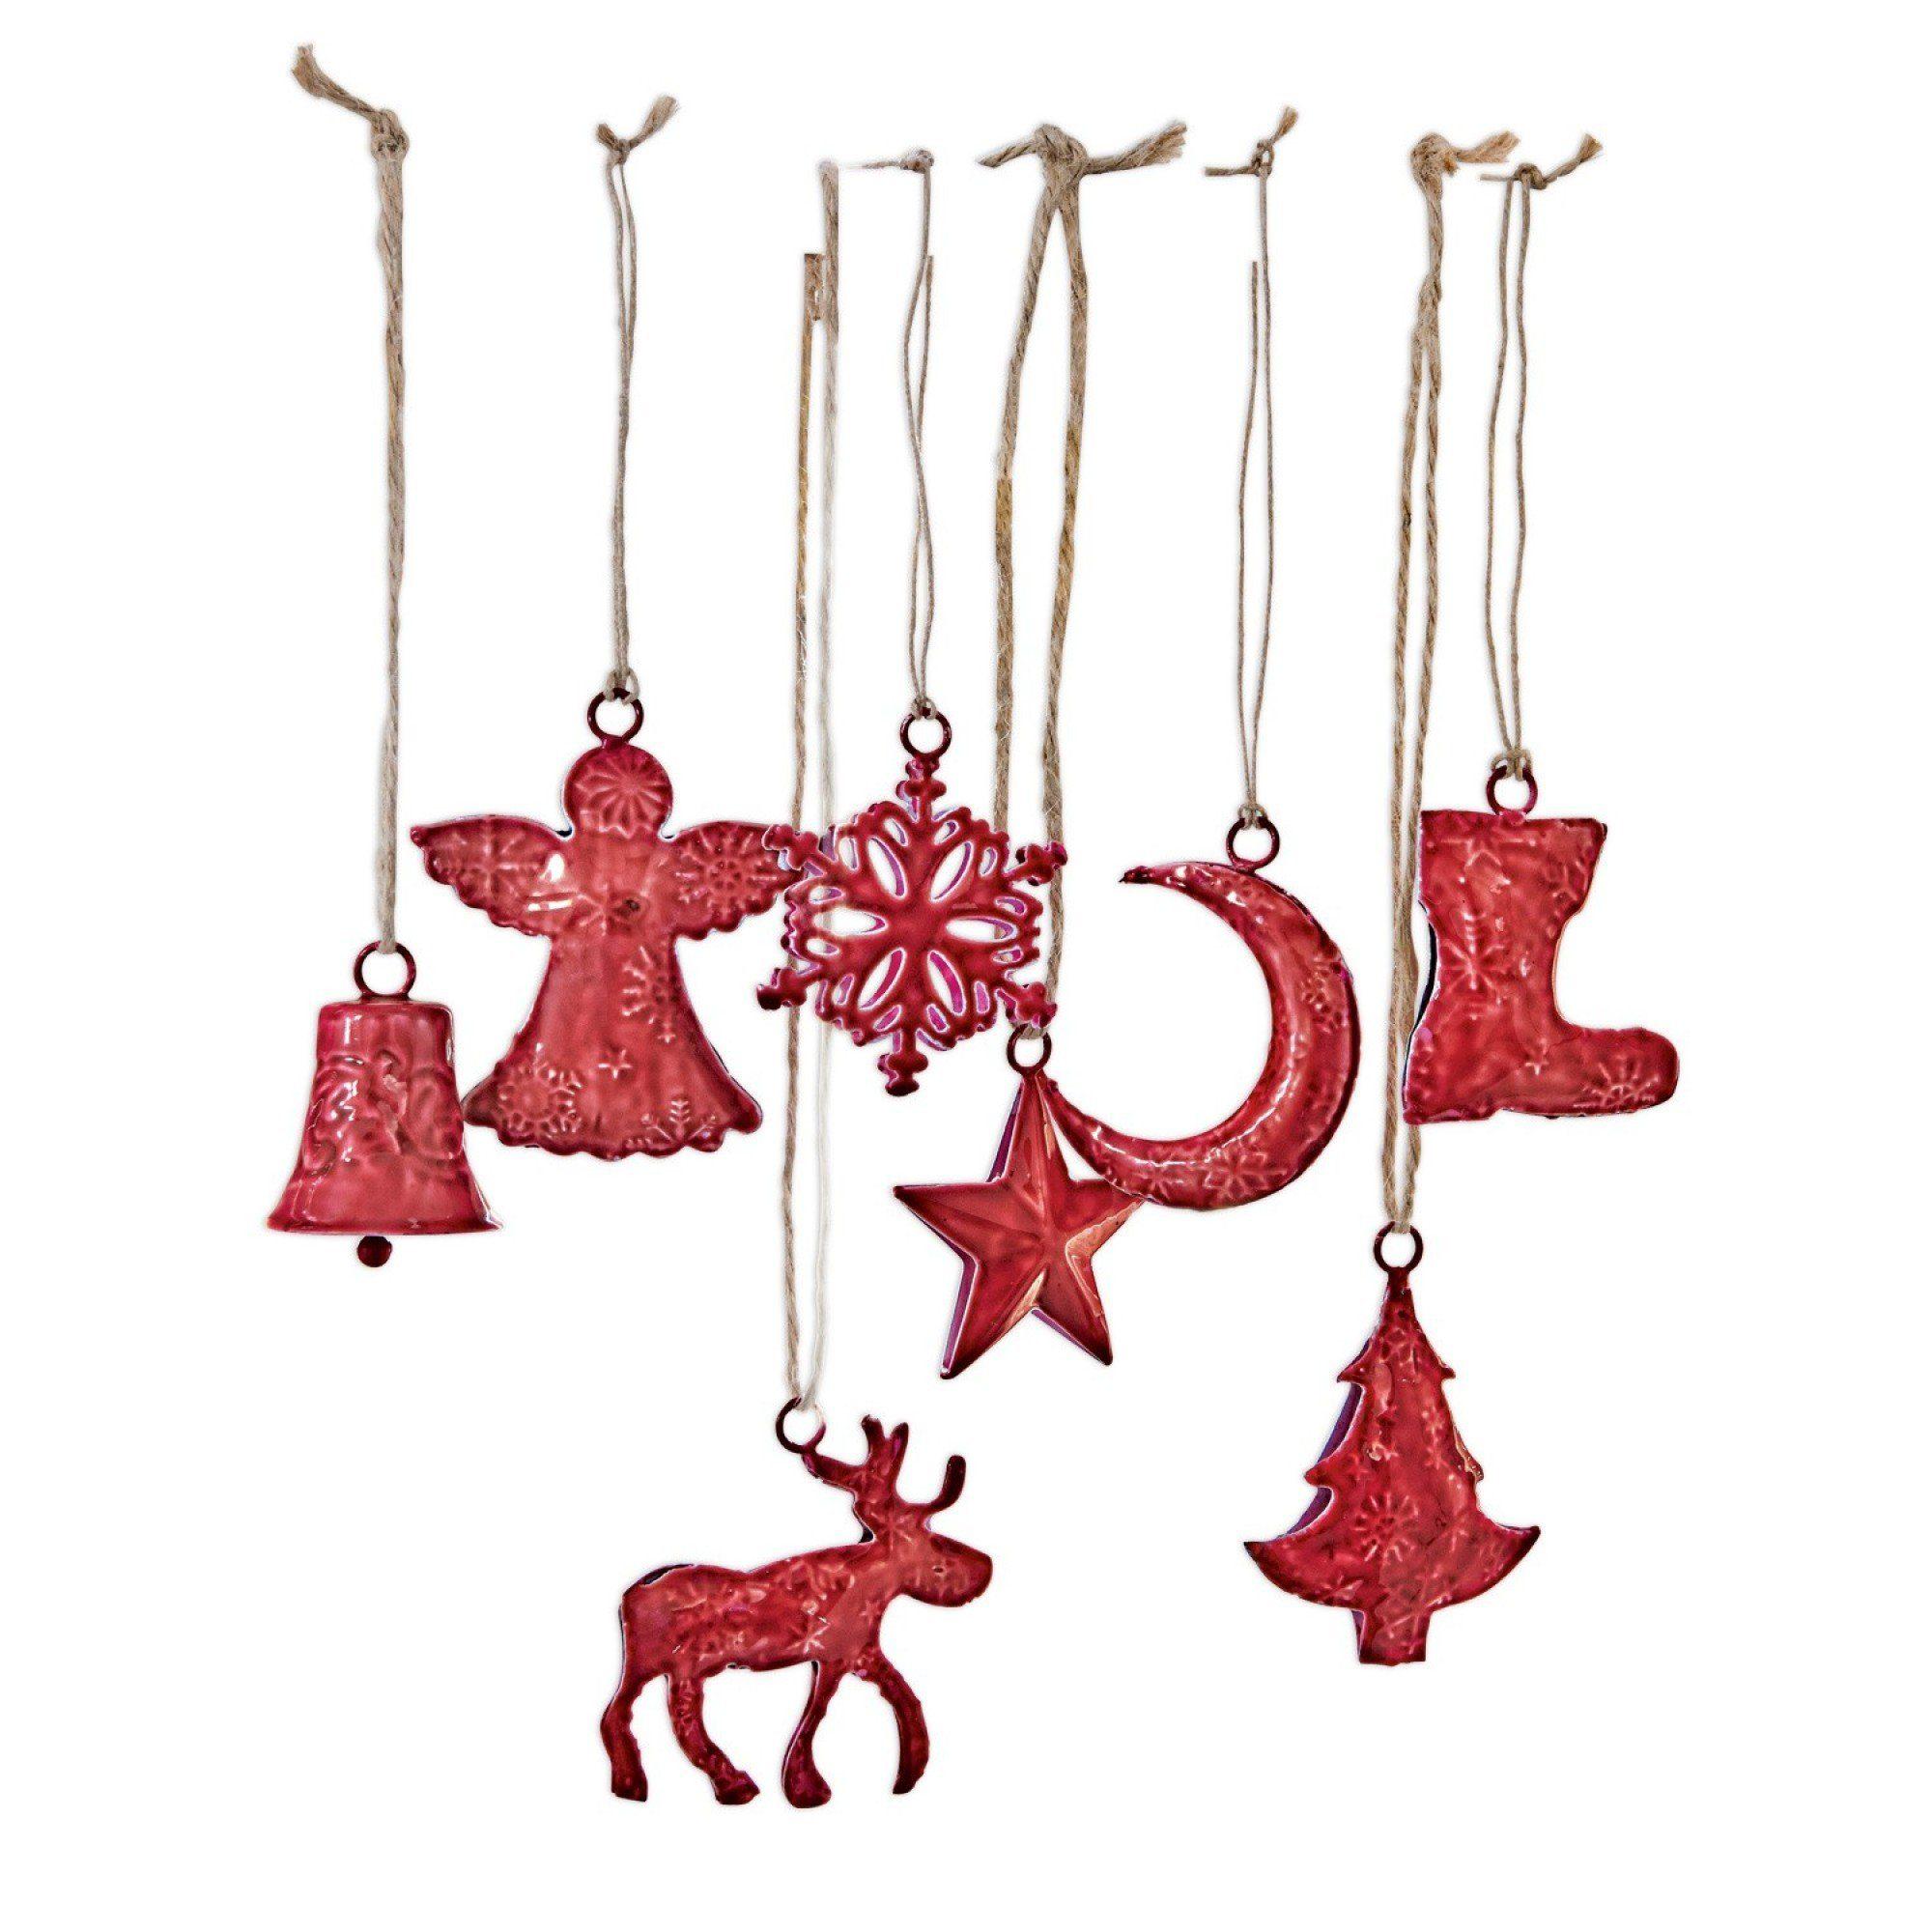 Loberon Weihnachtsschmuck 8er-Set »Rudy & Co.«